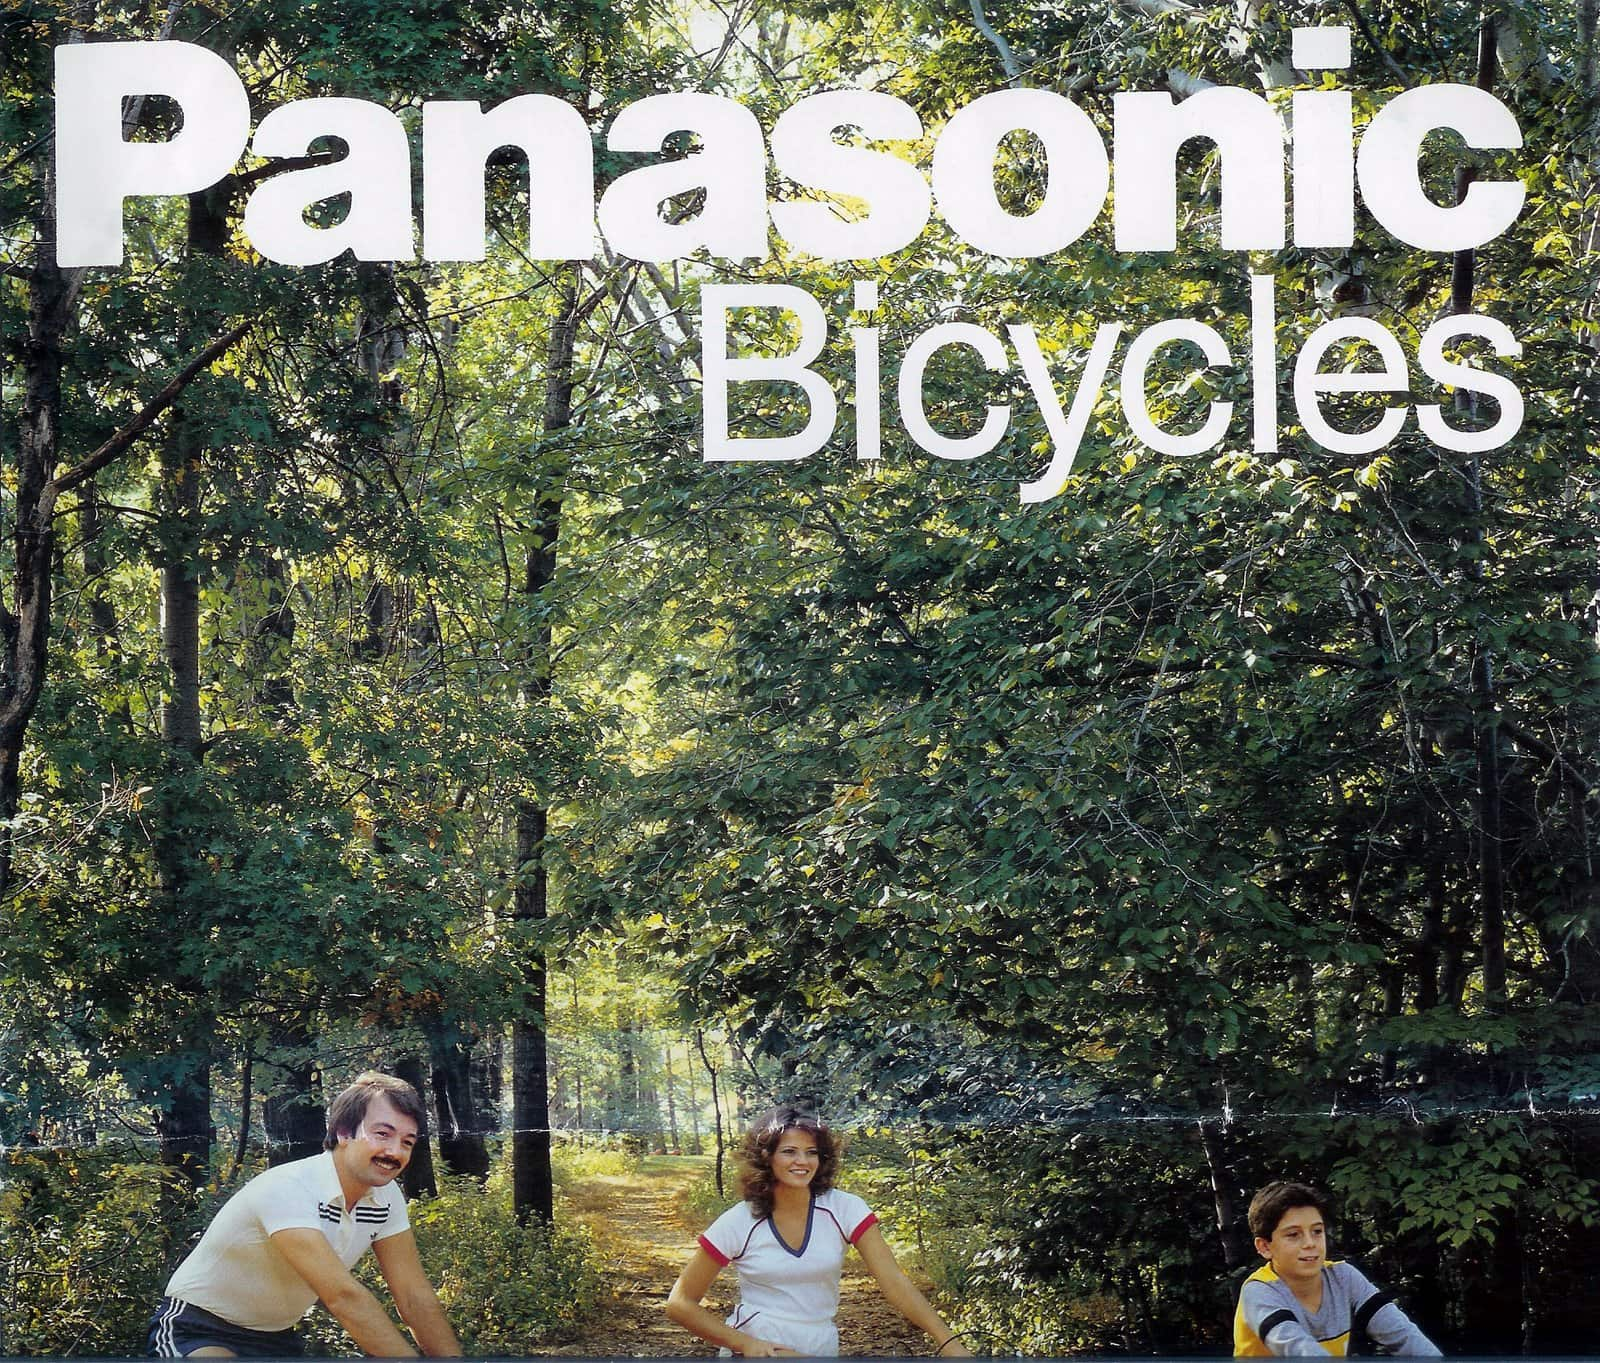 1984 Catalog cover (top half)